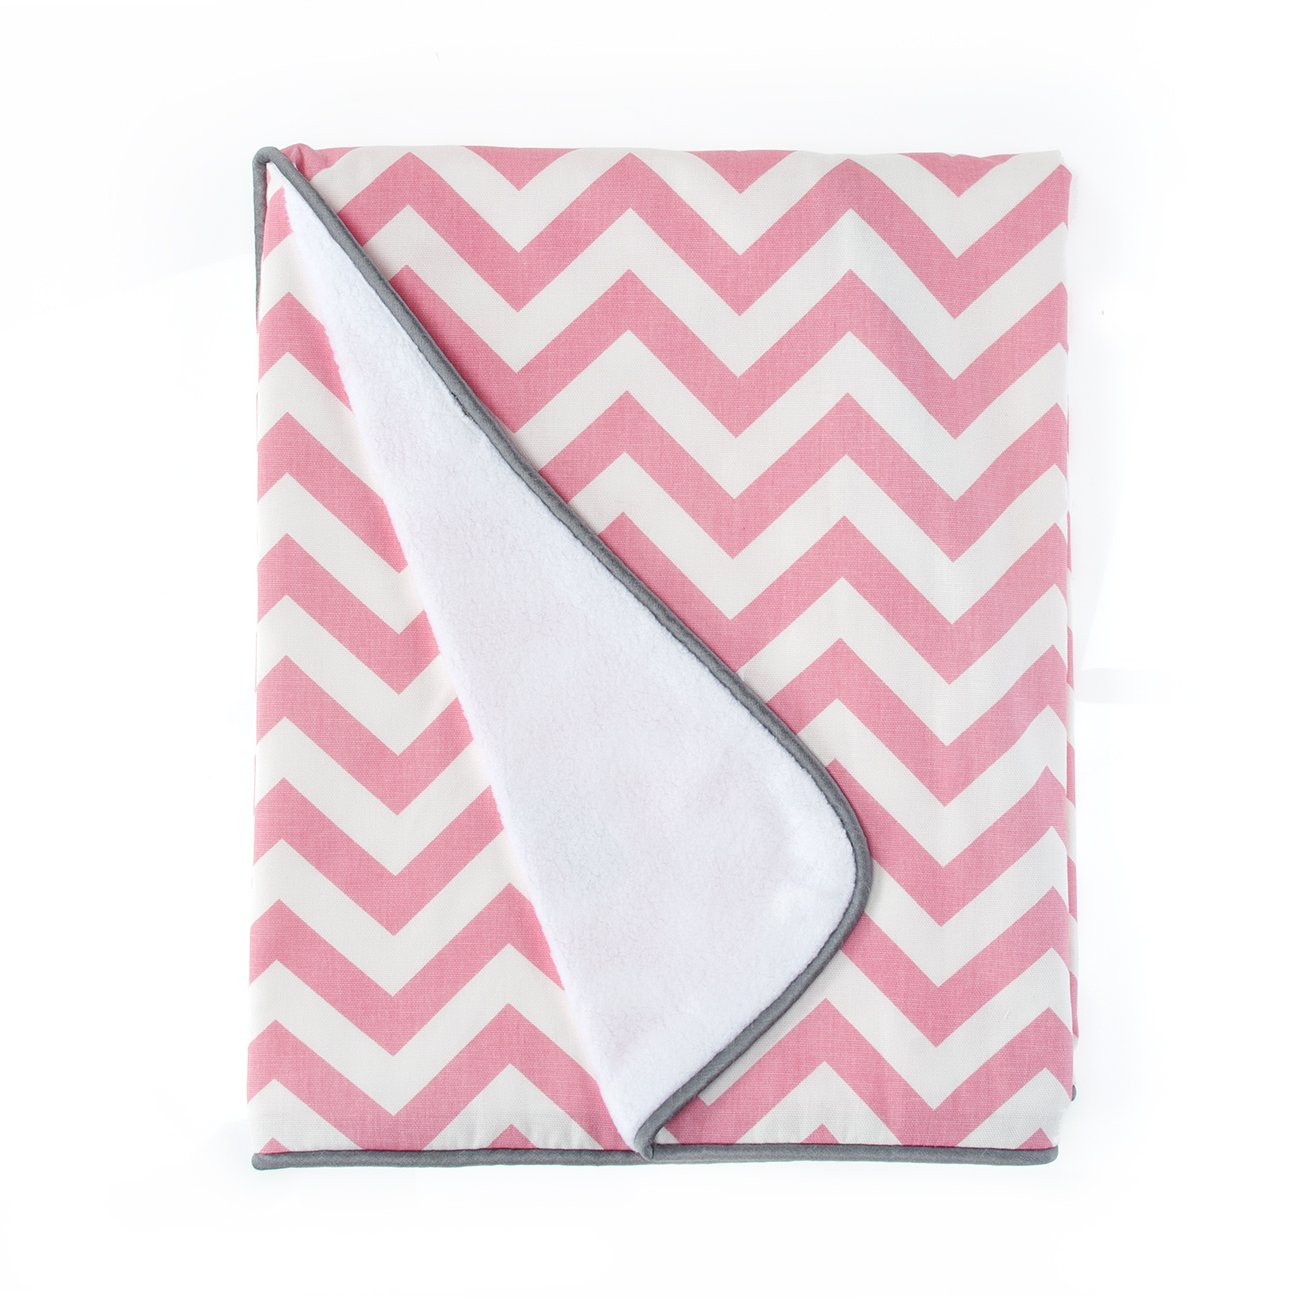 Sweet Potato Swizzle Quilt, Grey/Pink/White